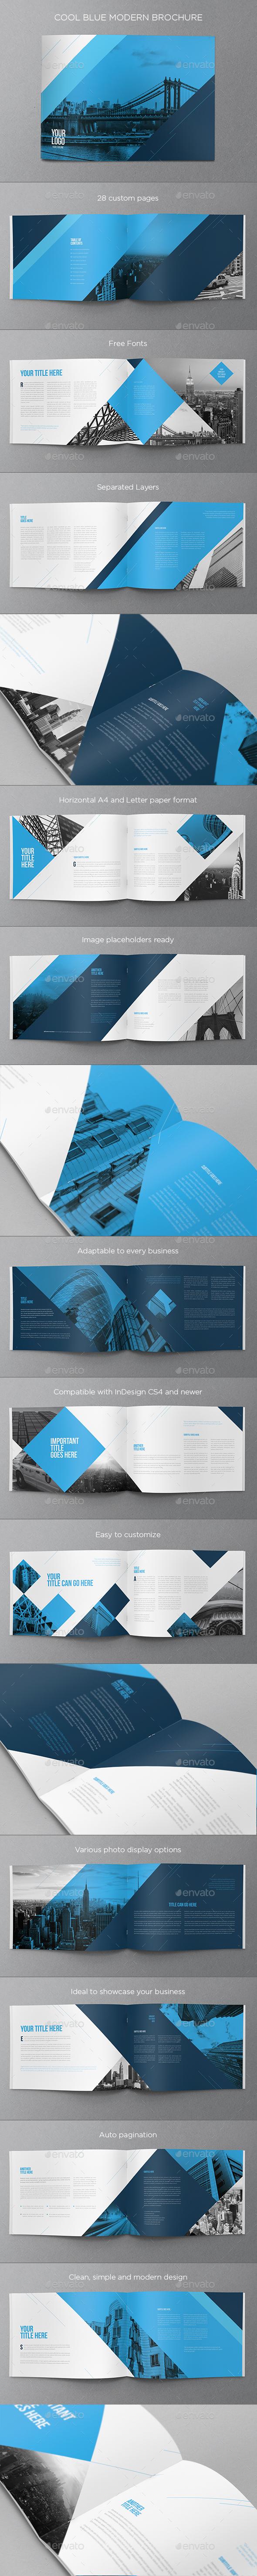 Cool Blue Modern Brochure - Brochures Print Templates